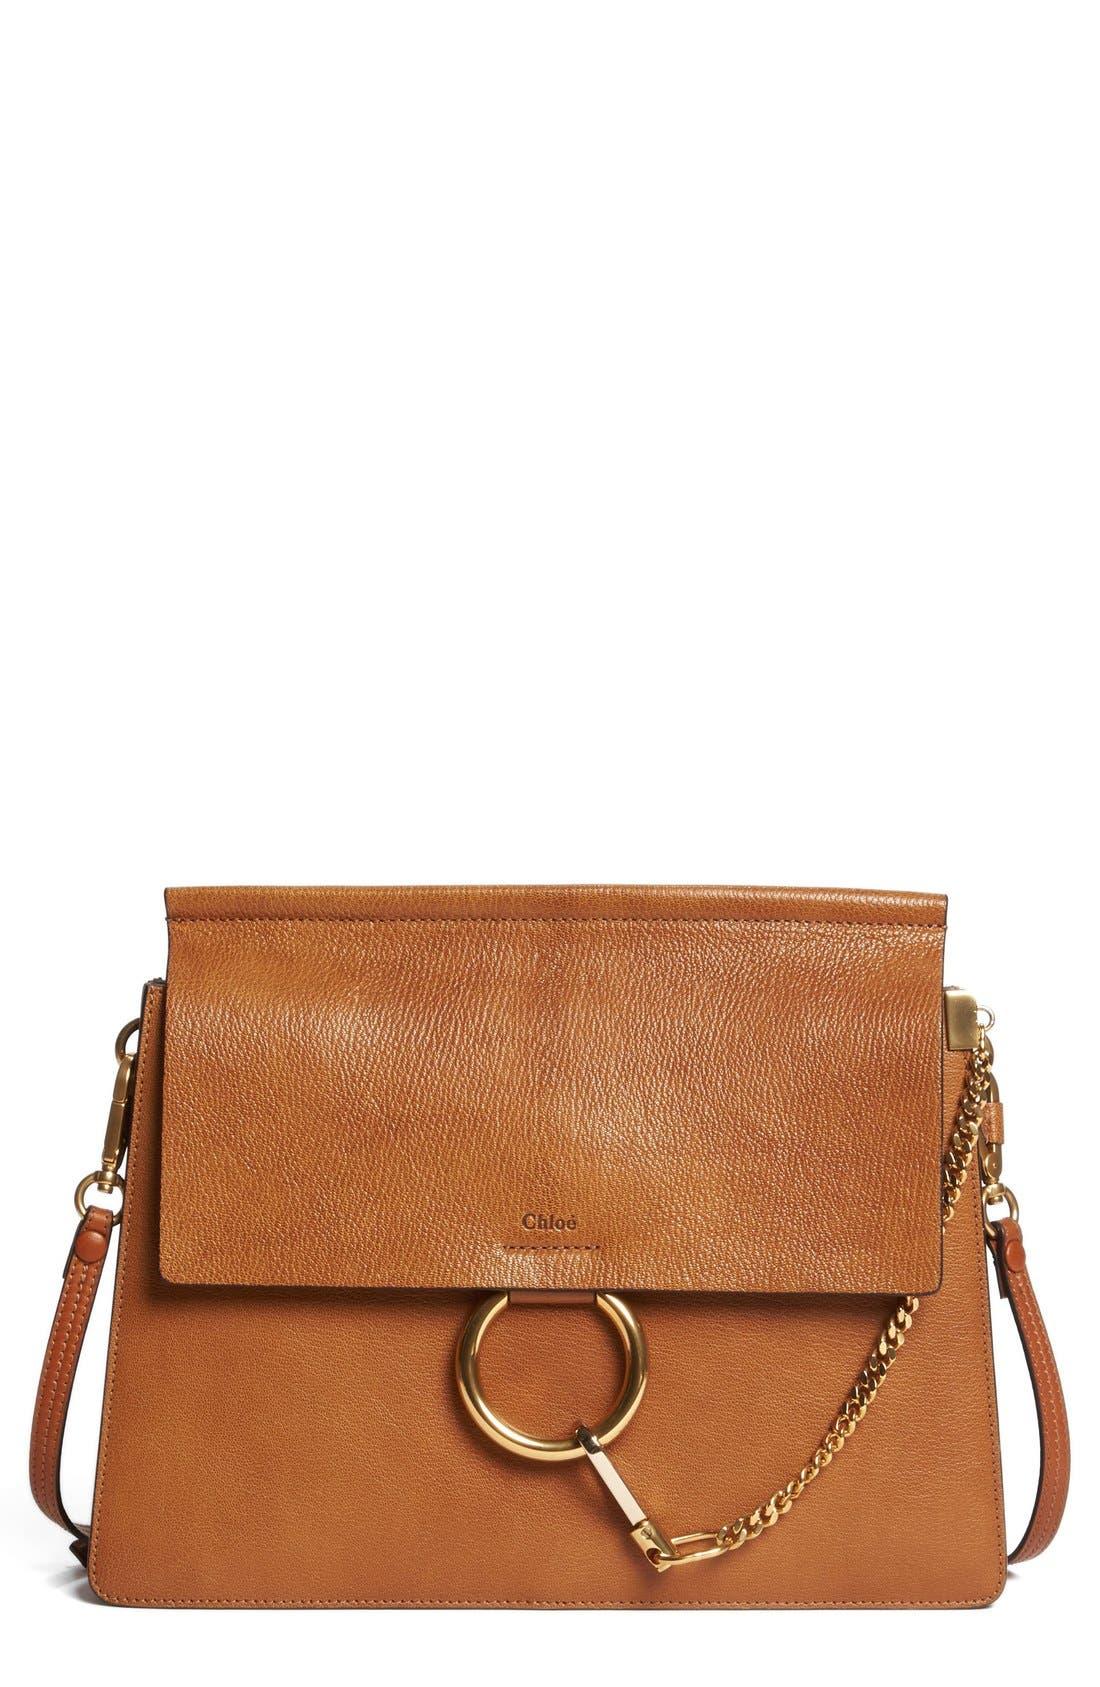 Faye Goatskin Leather Shoulder Bag,                             Main thumbnail 1, color,